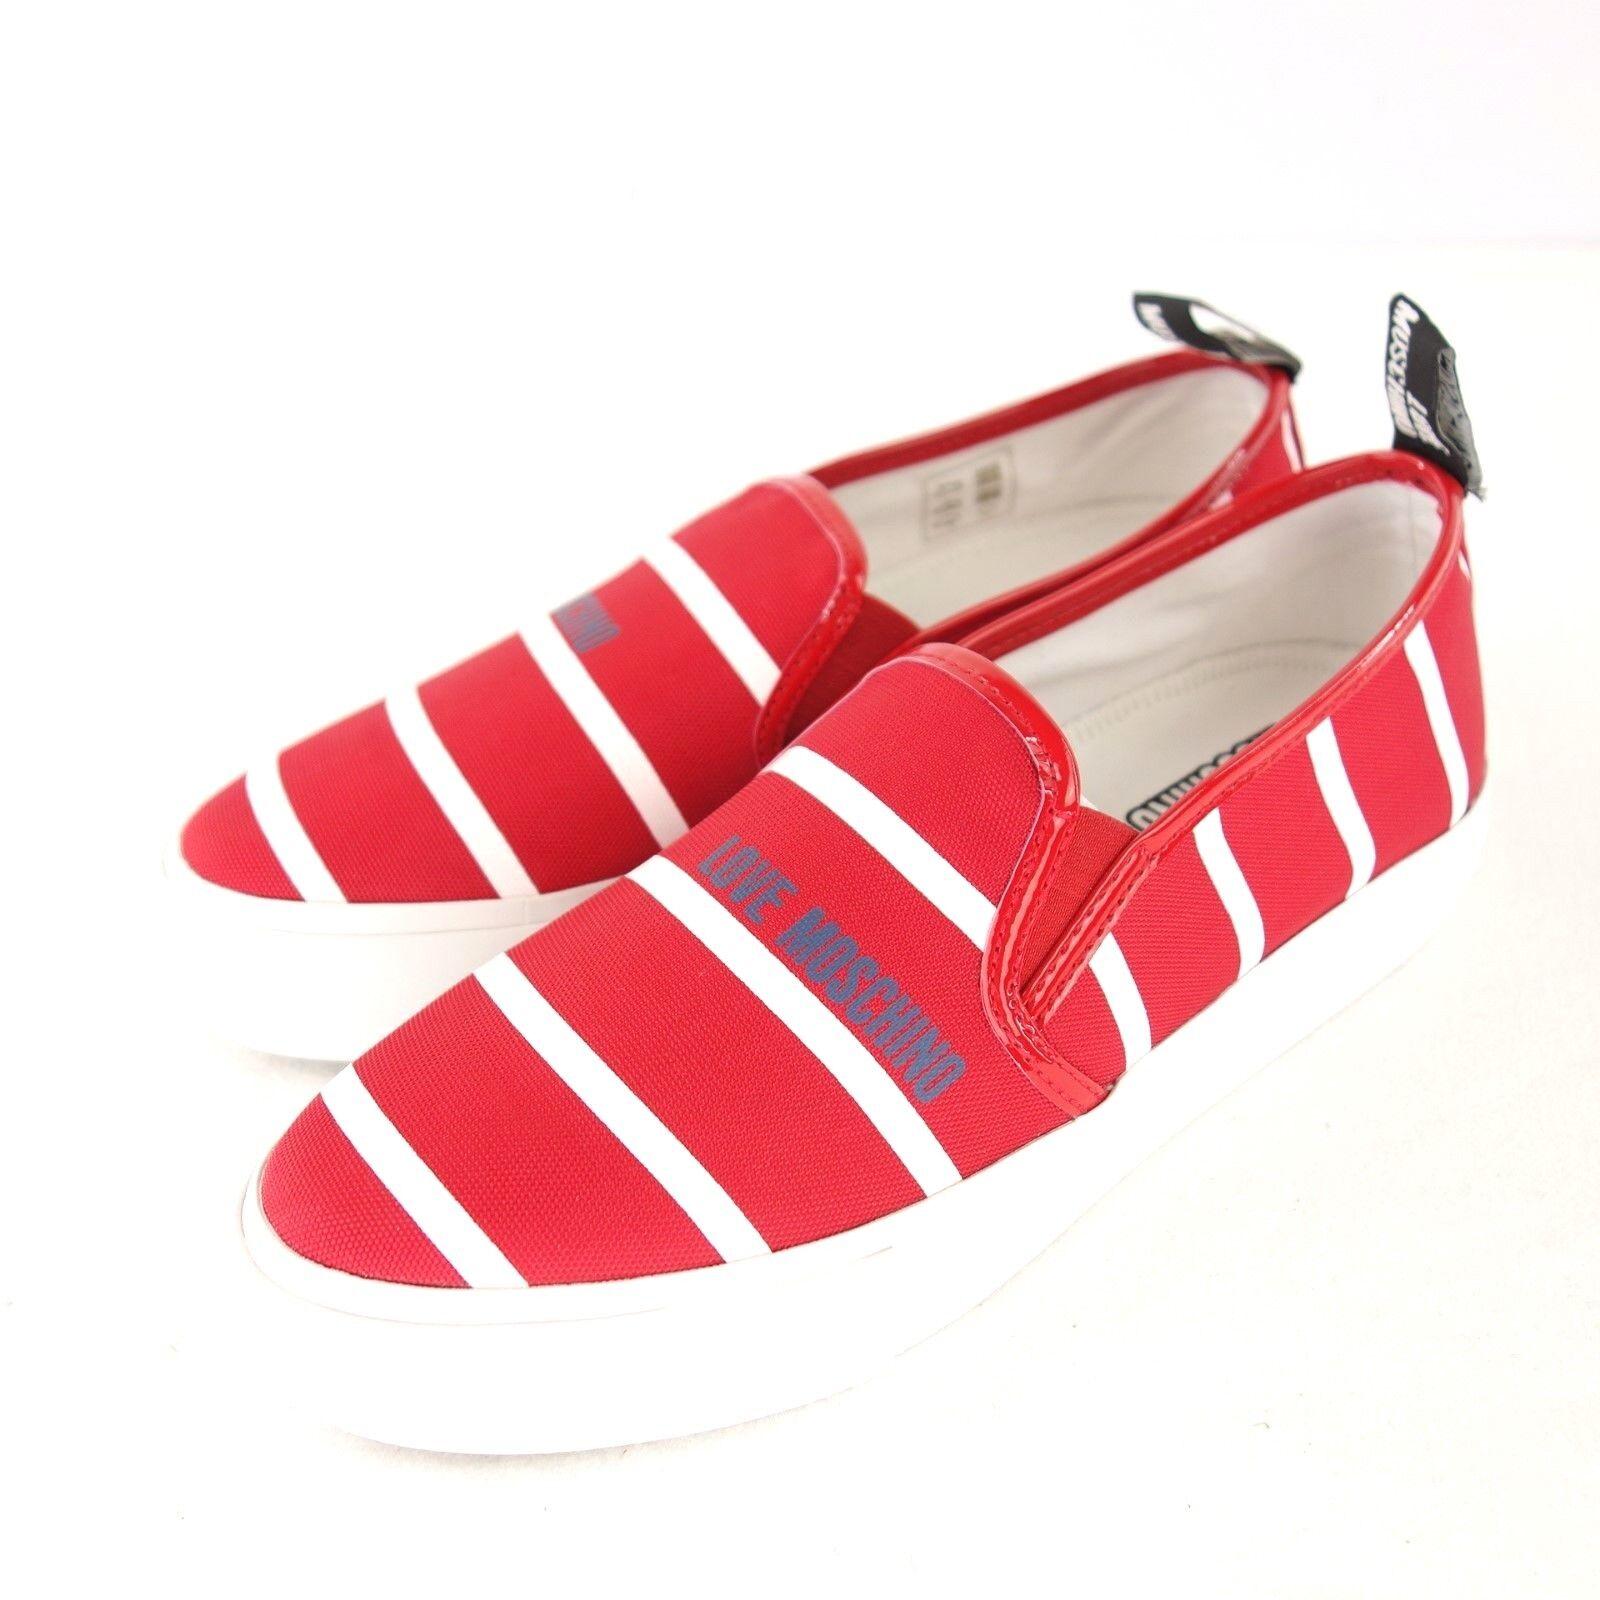 MOSCHINO LOVE Damen Sneaker 40 Rot Weiß Canvas Slip On Schuhe Low NP 159 NEU